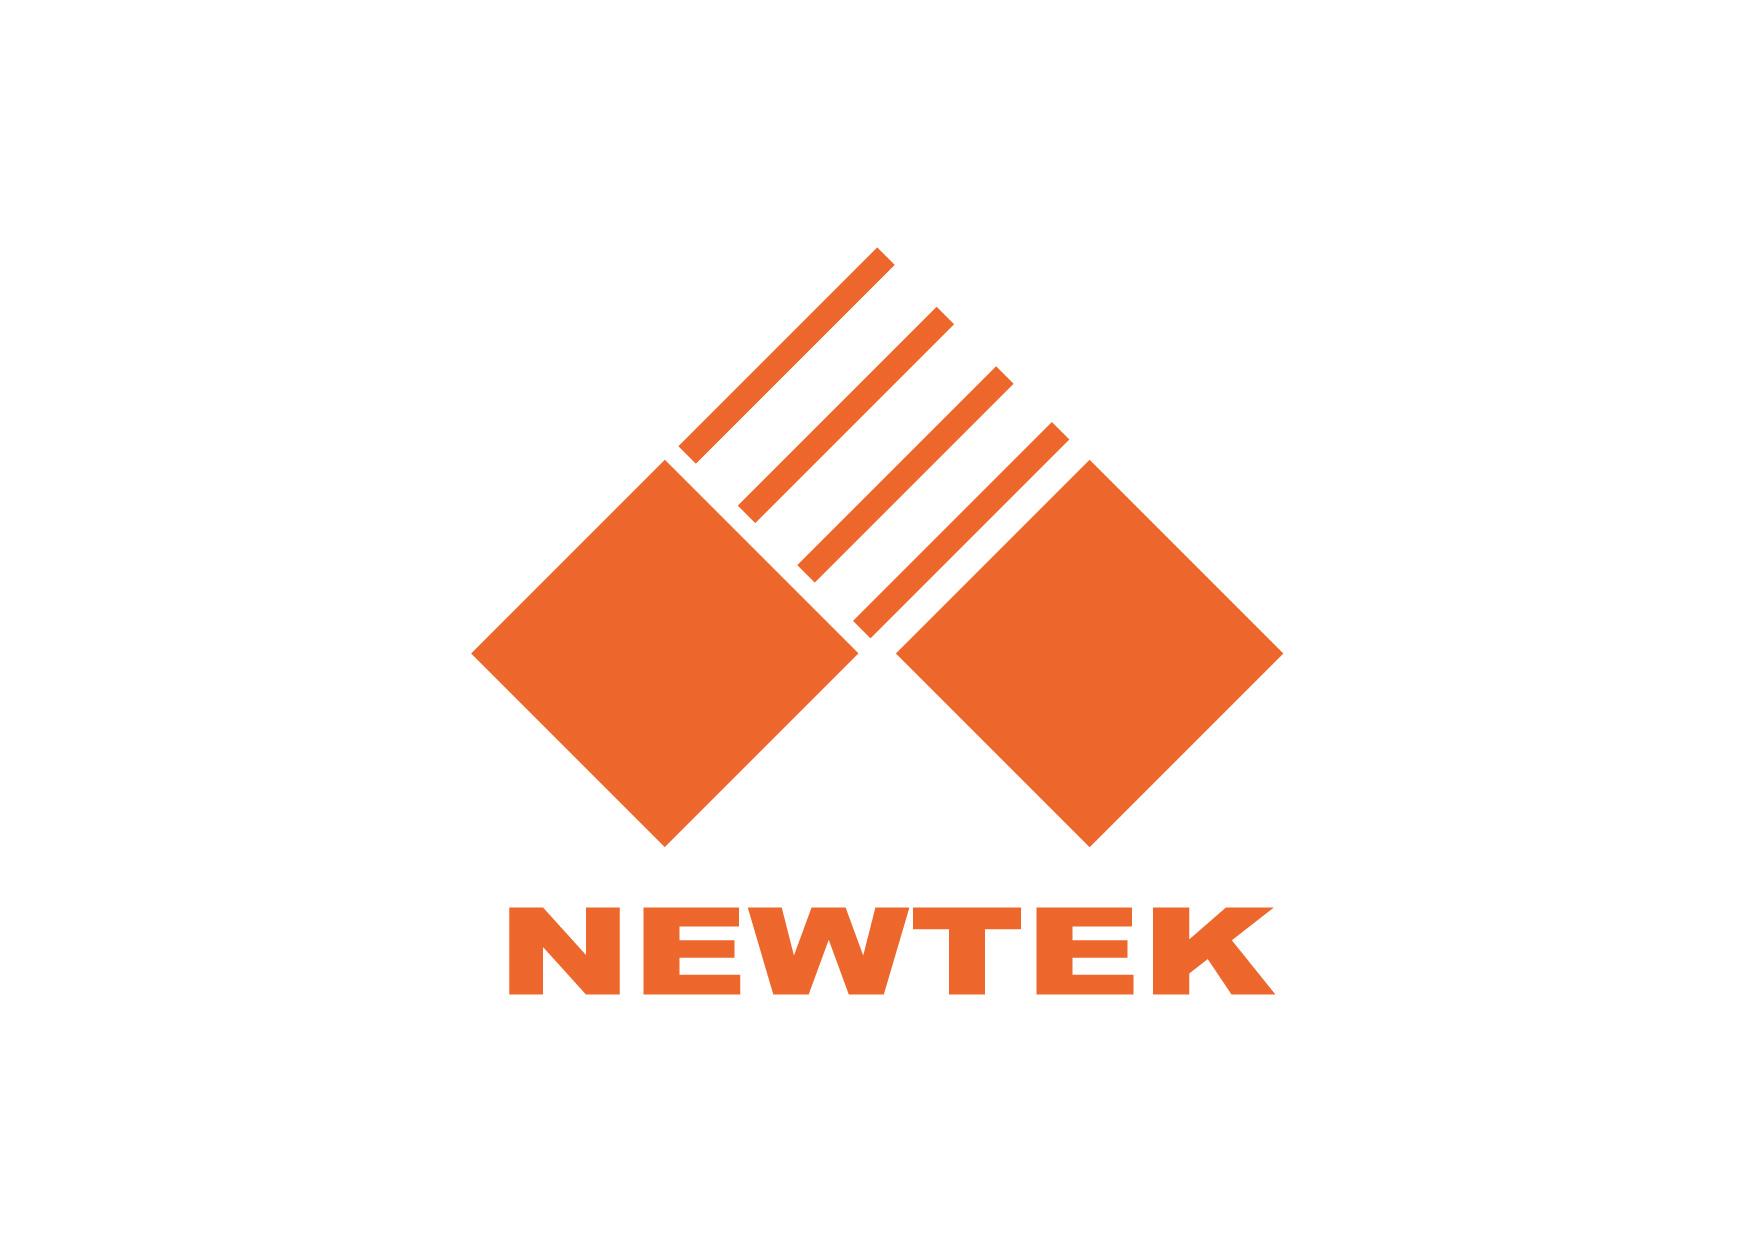 https://covialsa.com/wp-content/uploads/2019/12/logos_marca_covialsa_newtek.jpg